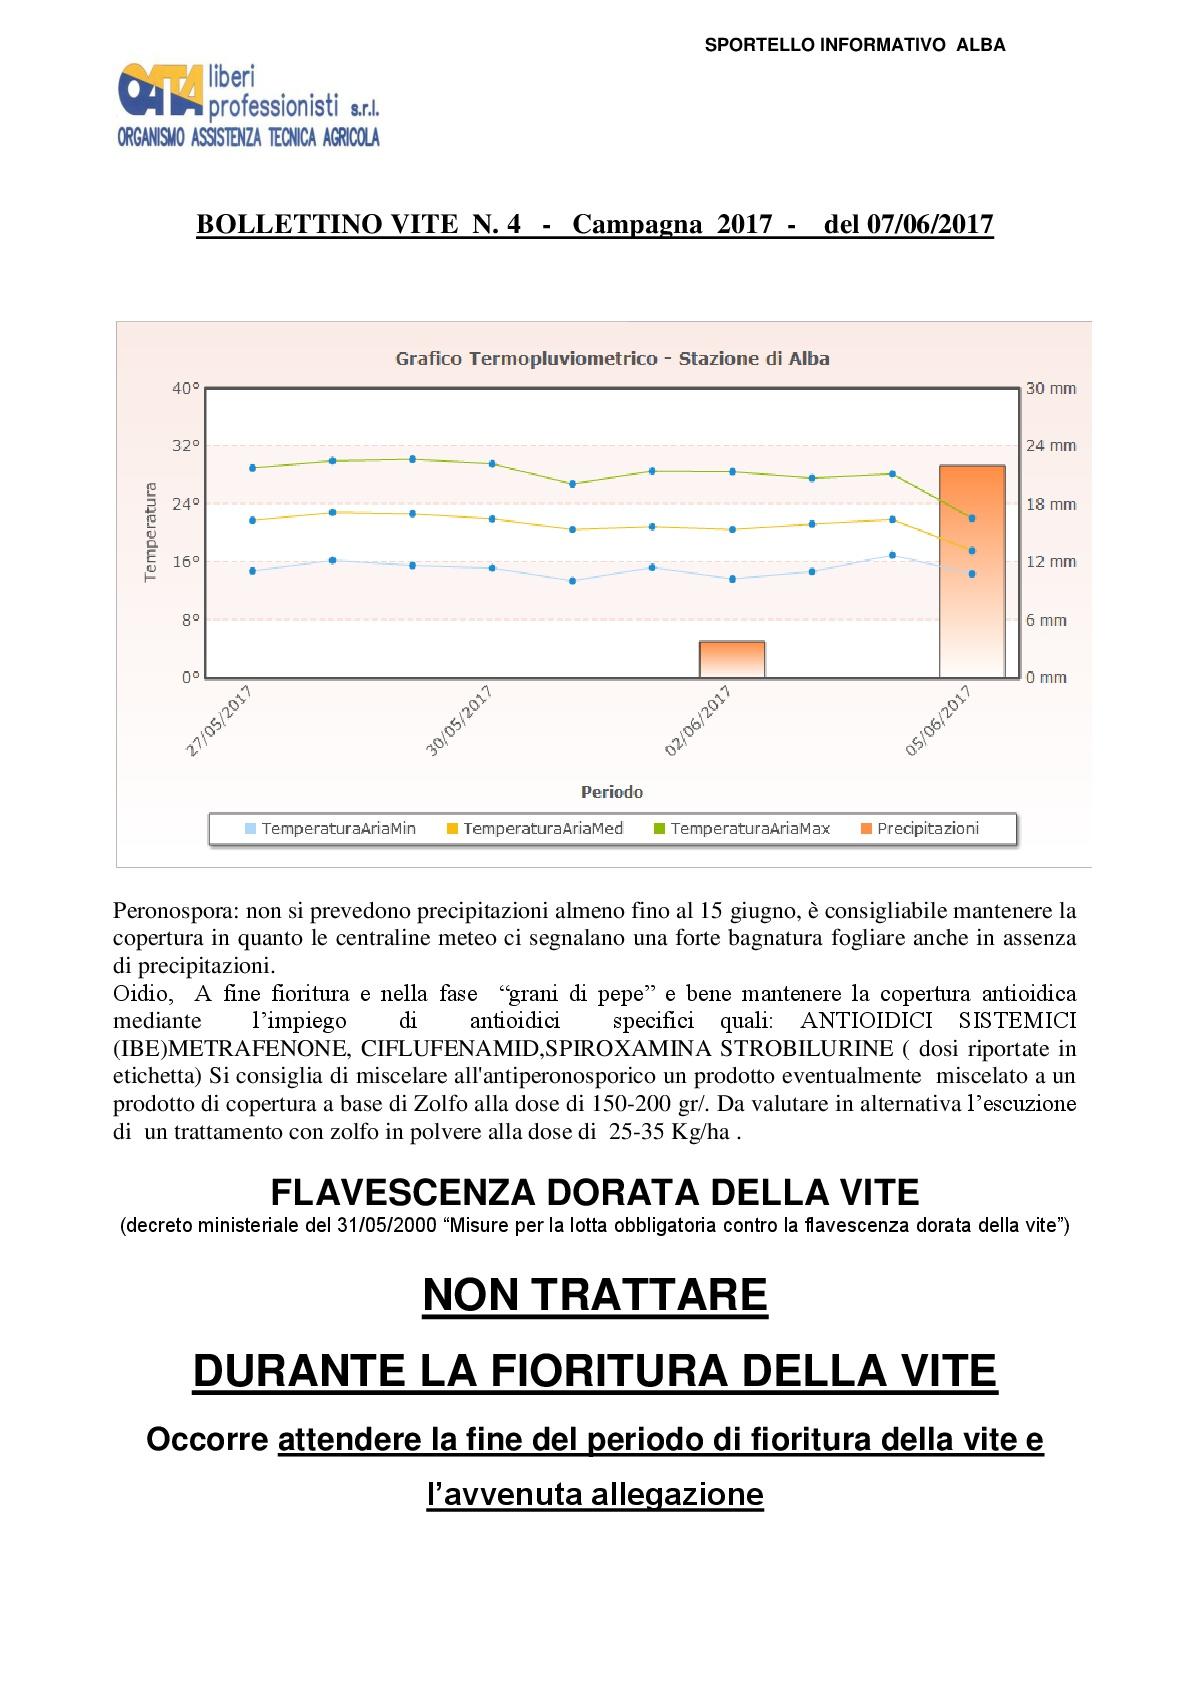 bollettino_vite_4_2017-001